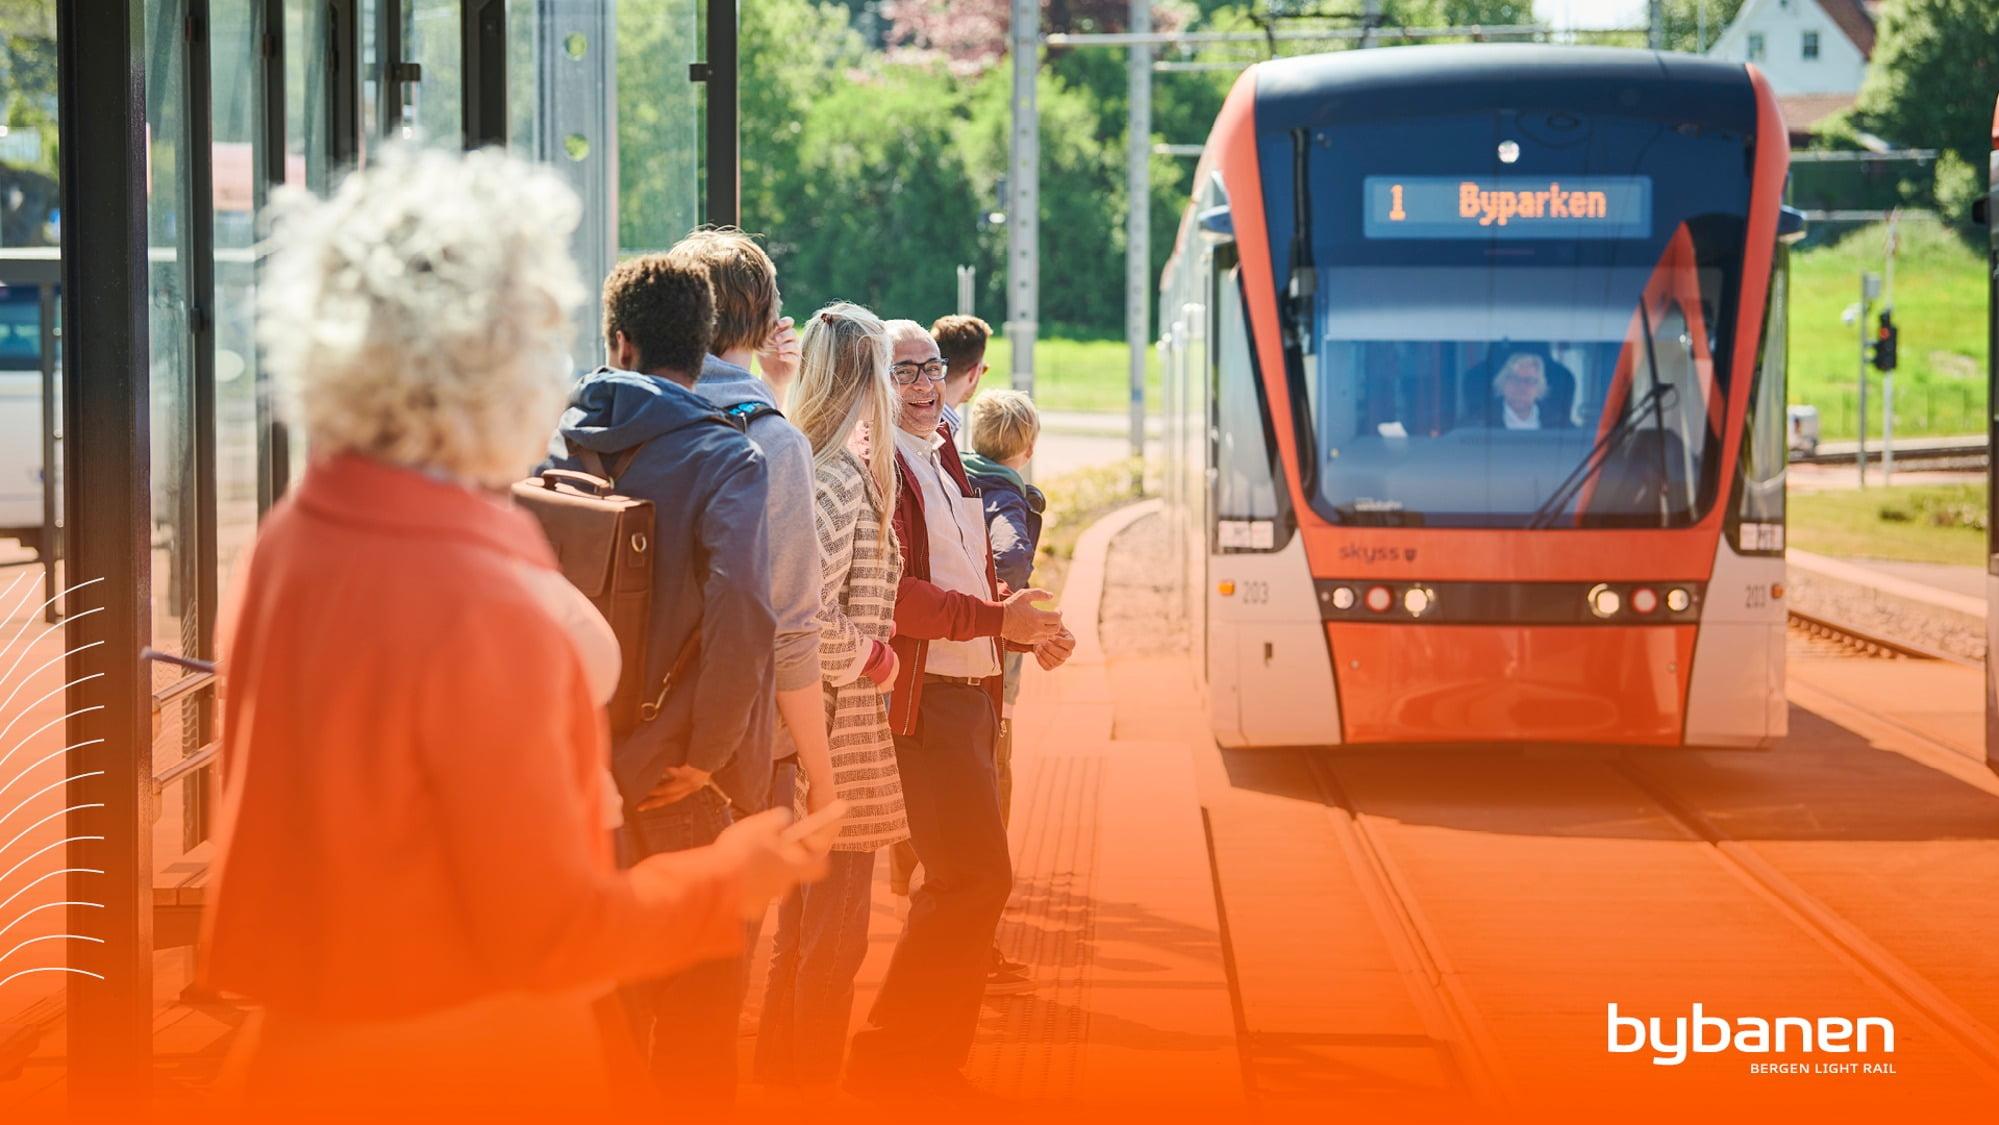 Display device, Public transport, Metro, Passenger, Travel, Orange